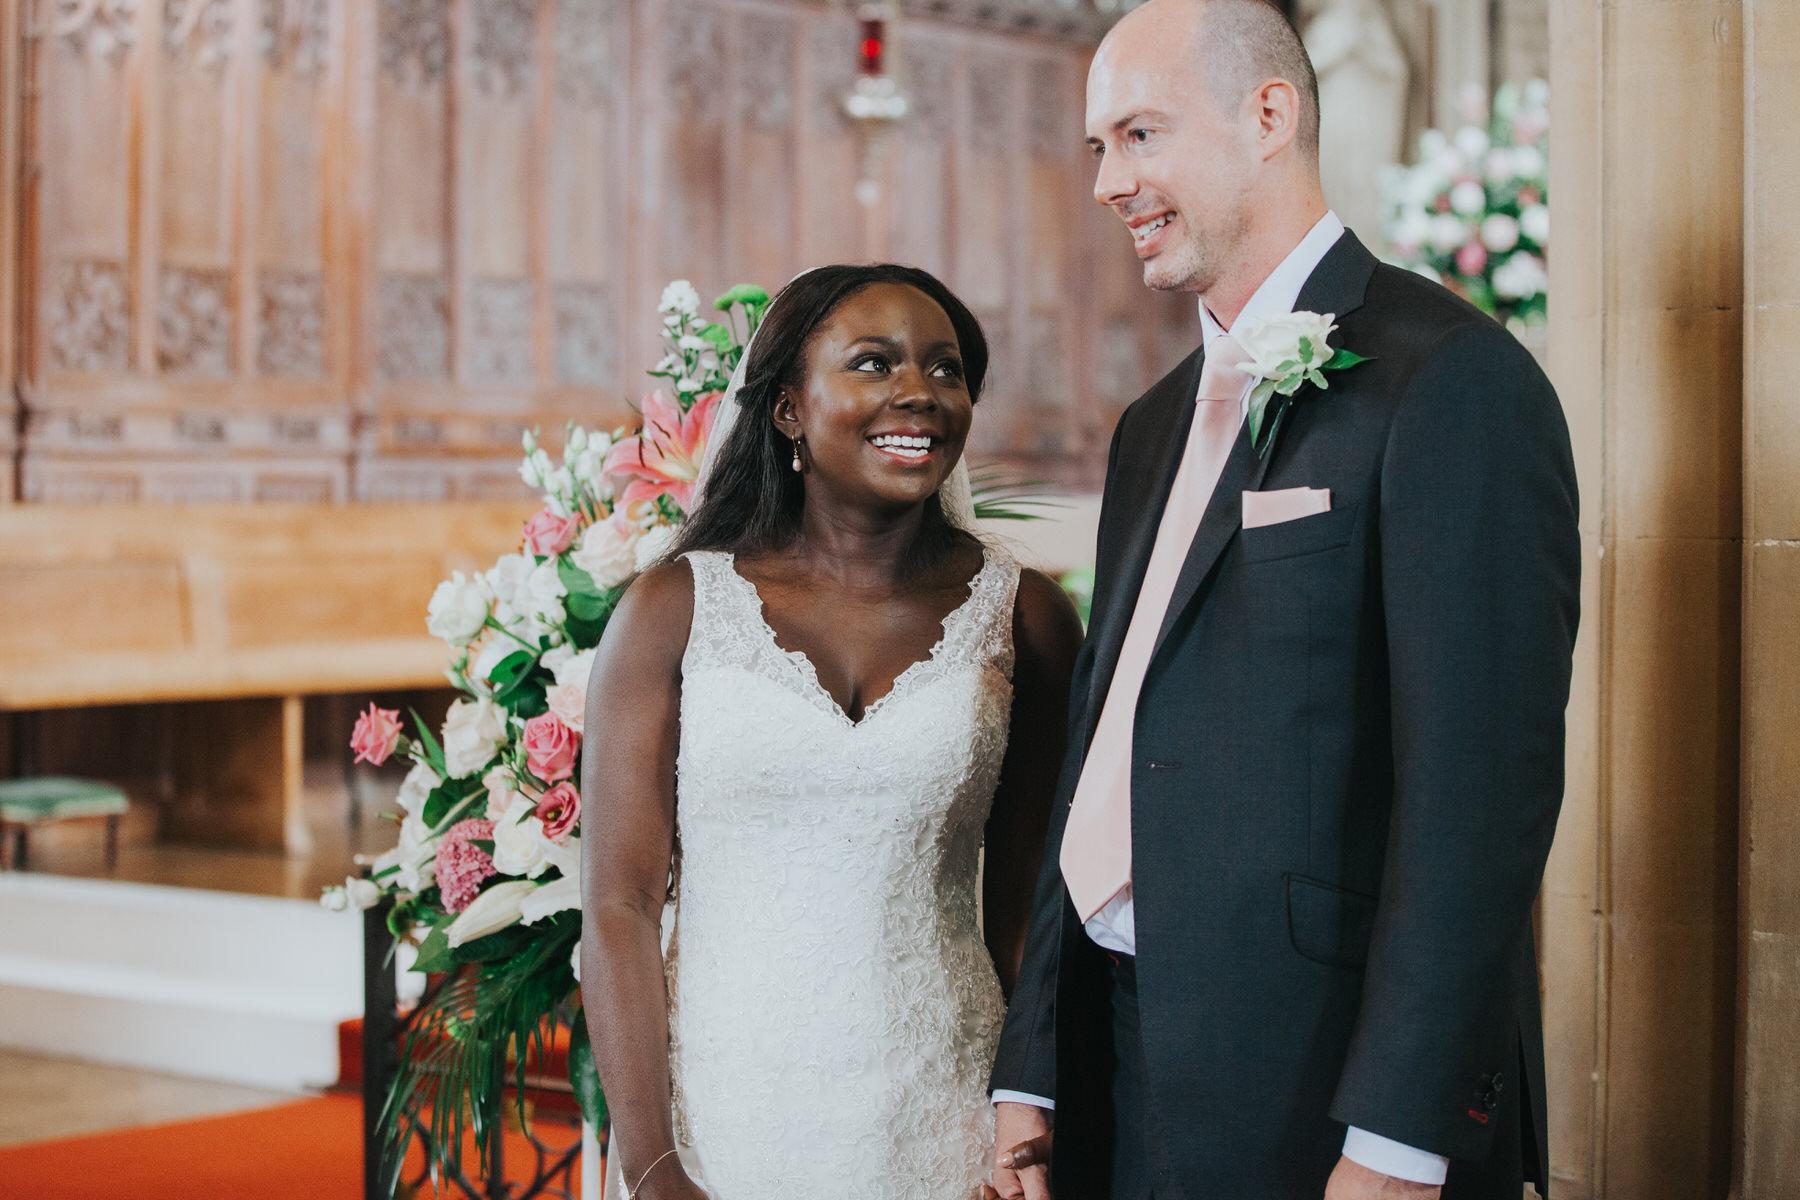 82 just married bride and groom London church wedding.jpg